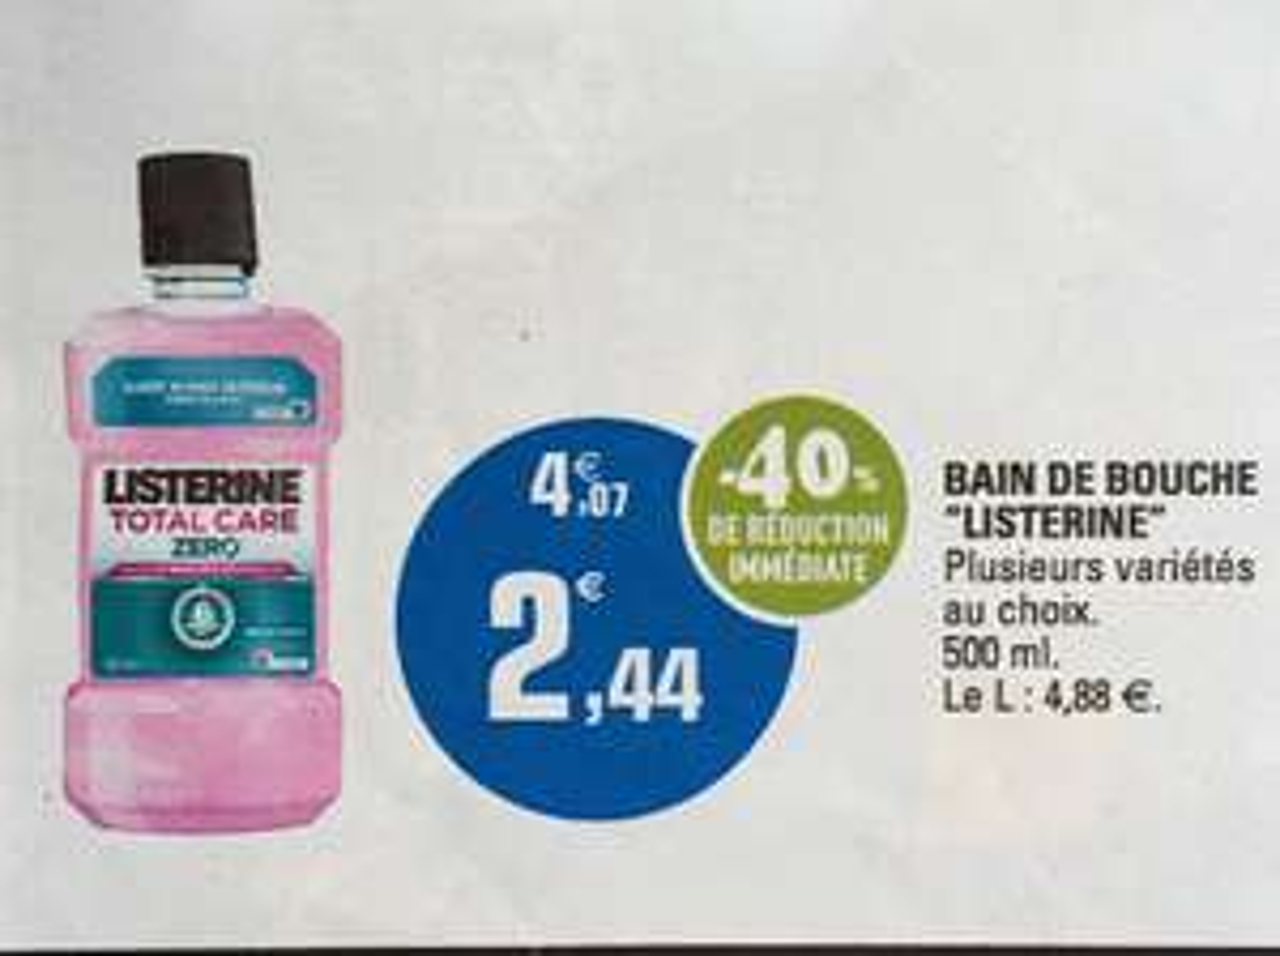 Bain de bouche Listerine 500ml